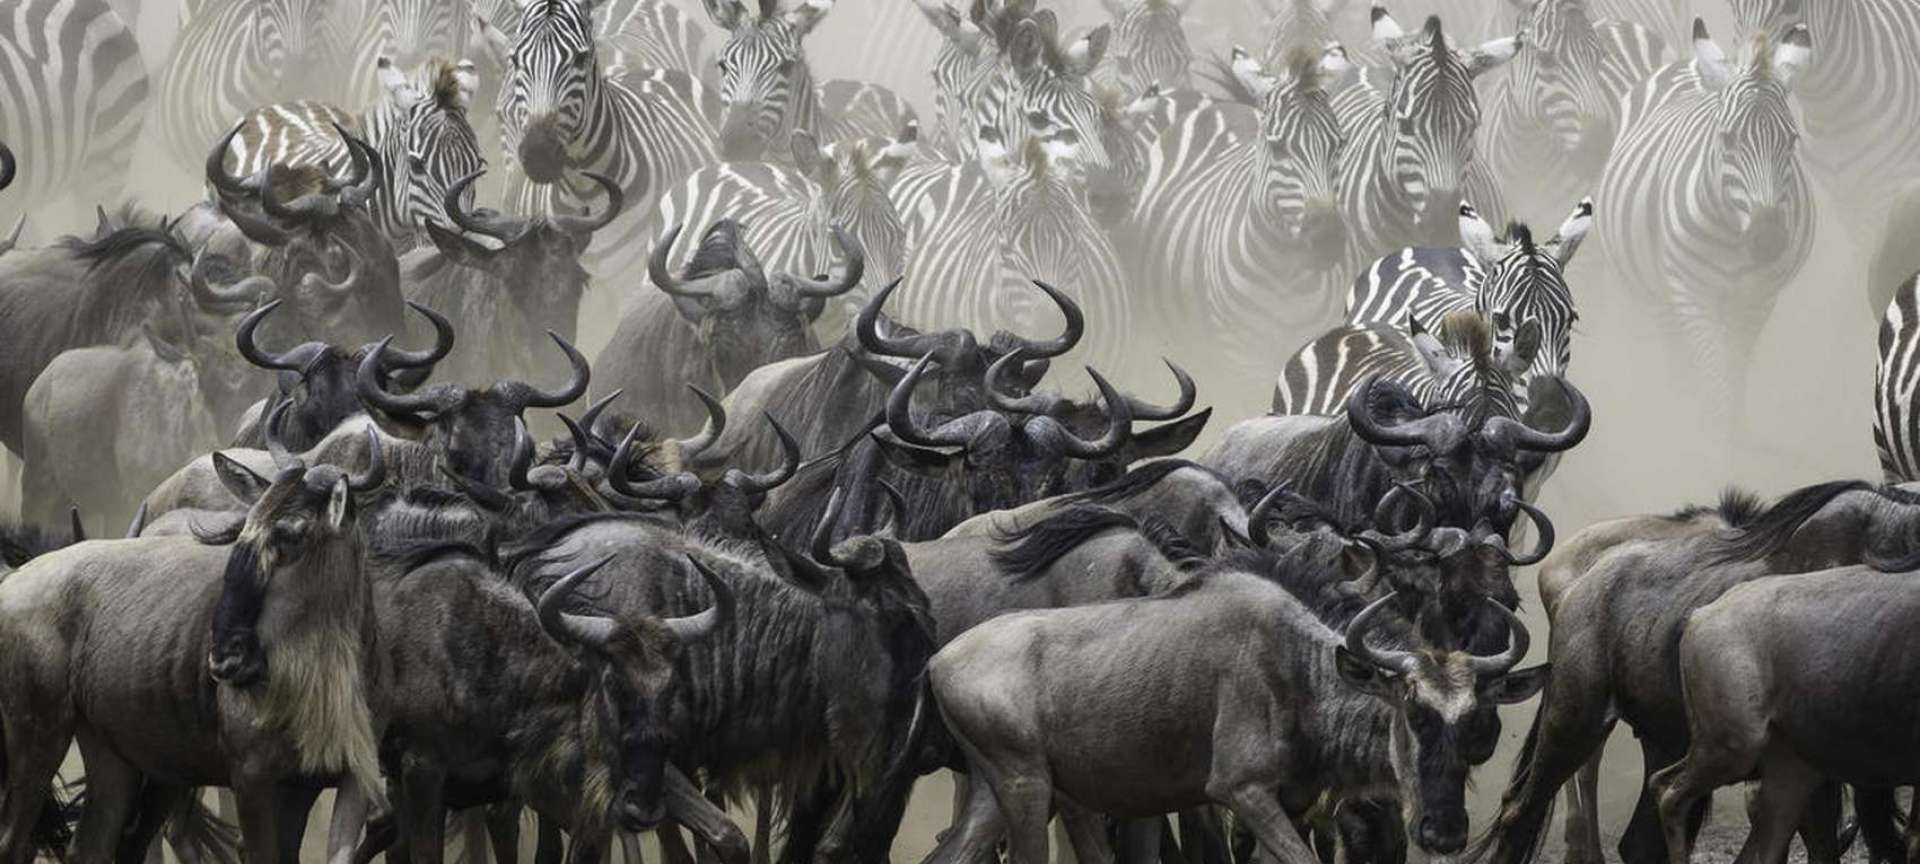 Luxury Safaris in Kenya - Africa Wildlife Safaris